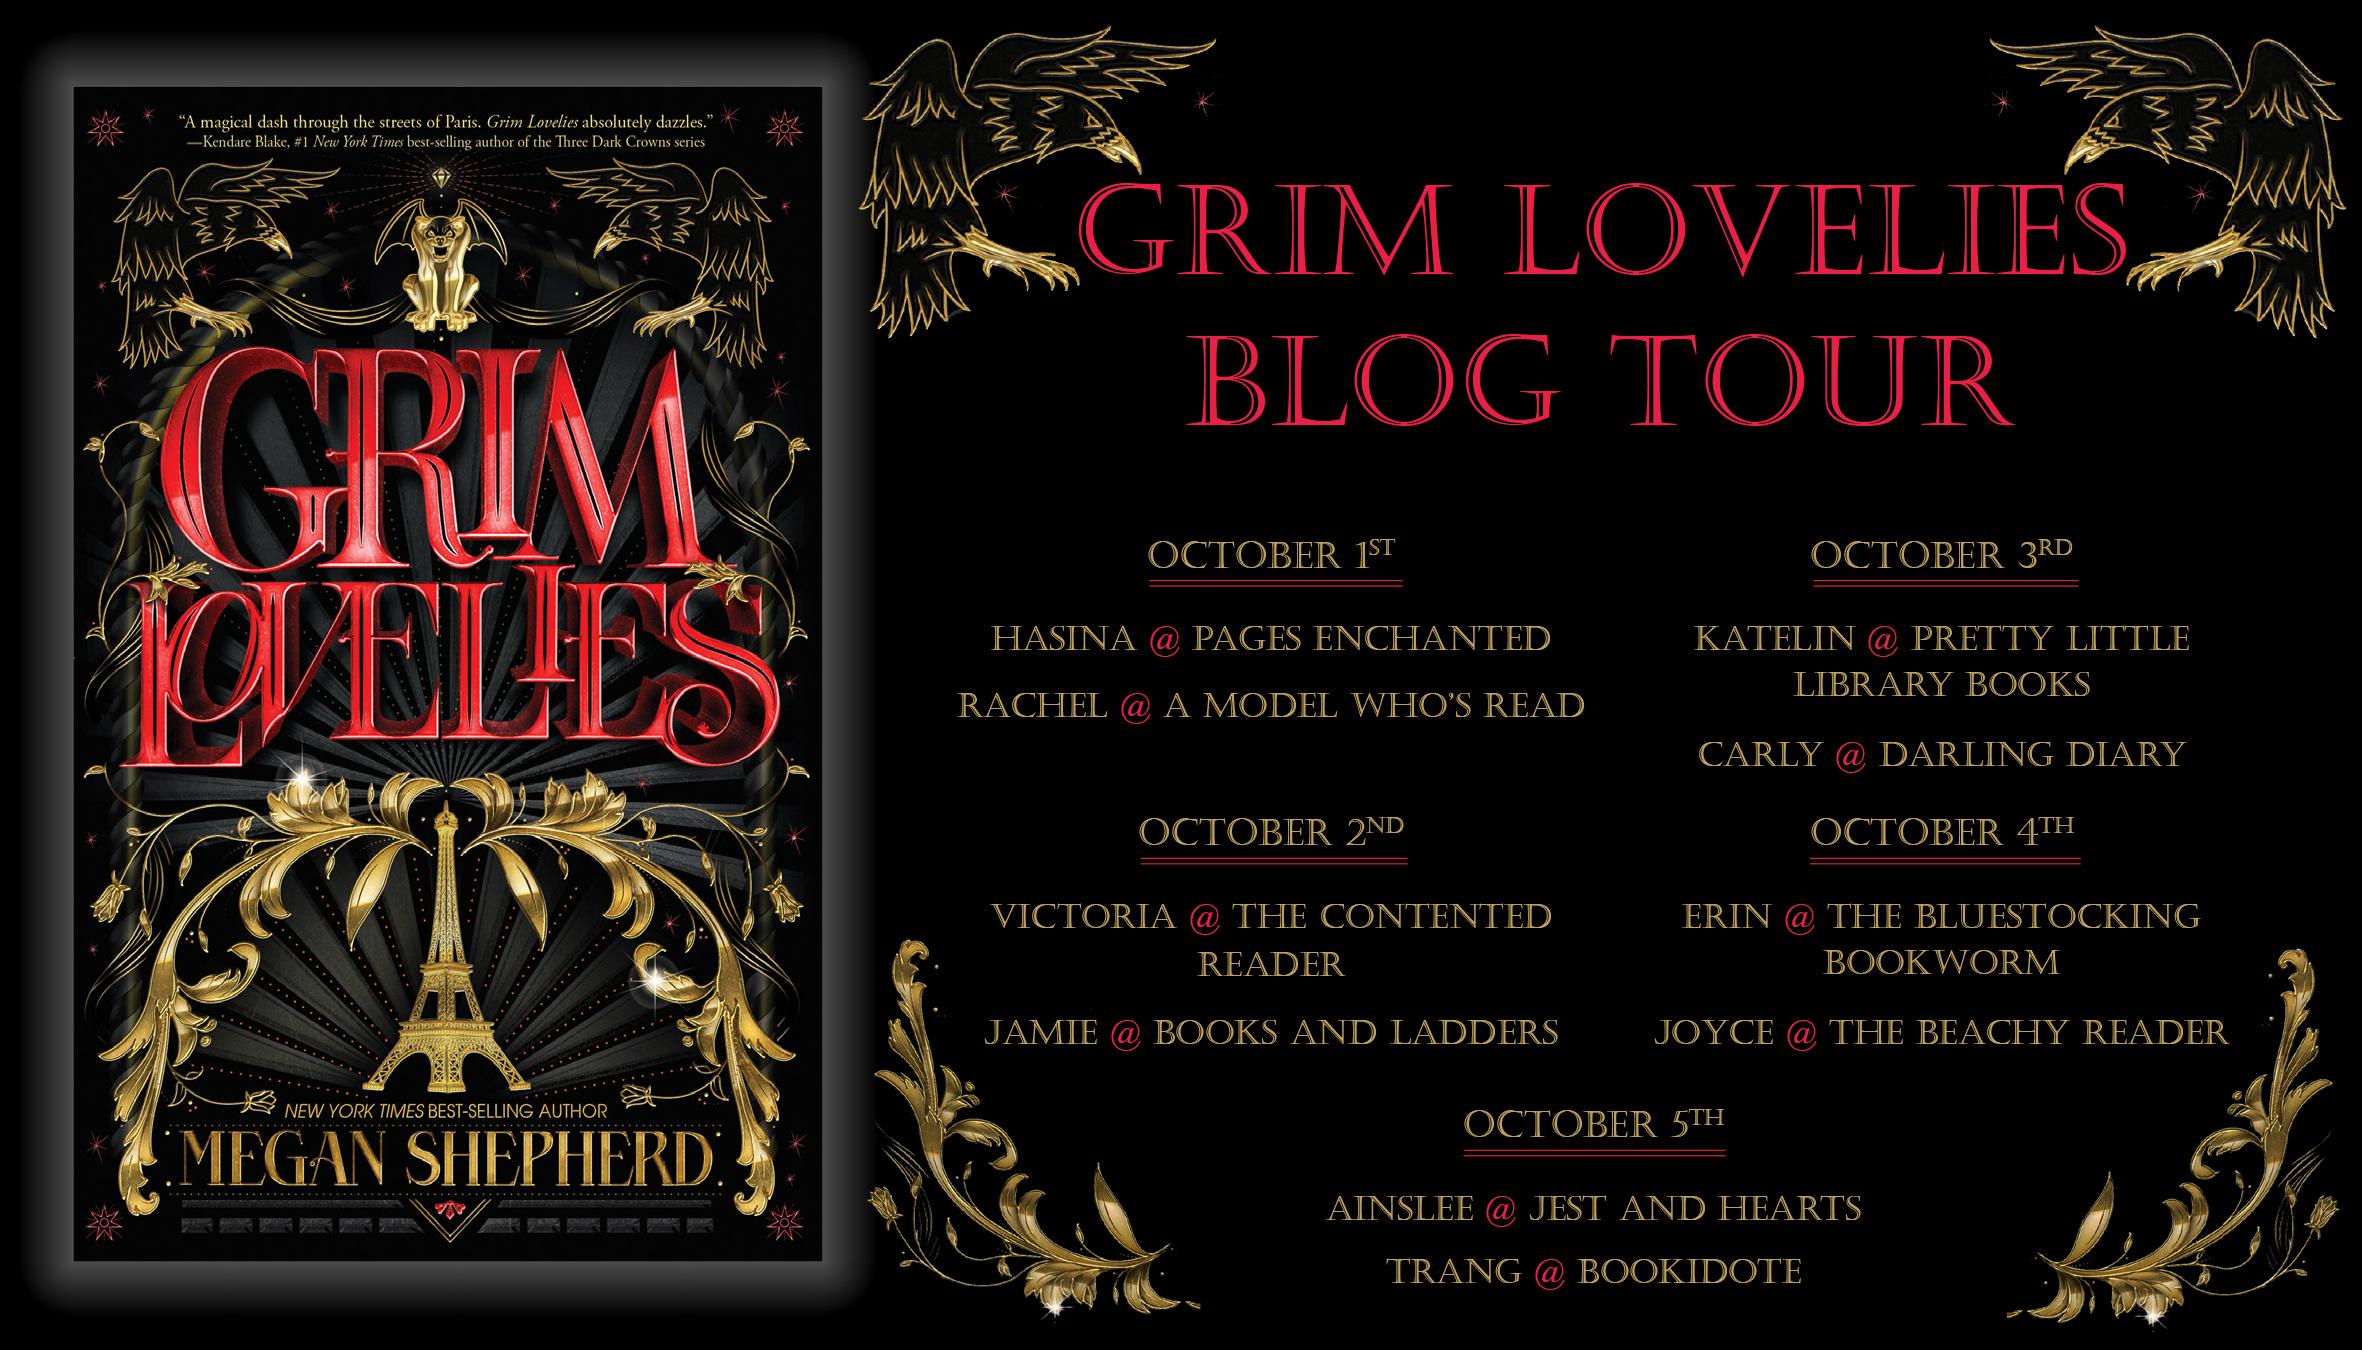 Grim Lovelies Blog Tour - The Contented Reader